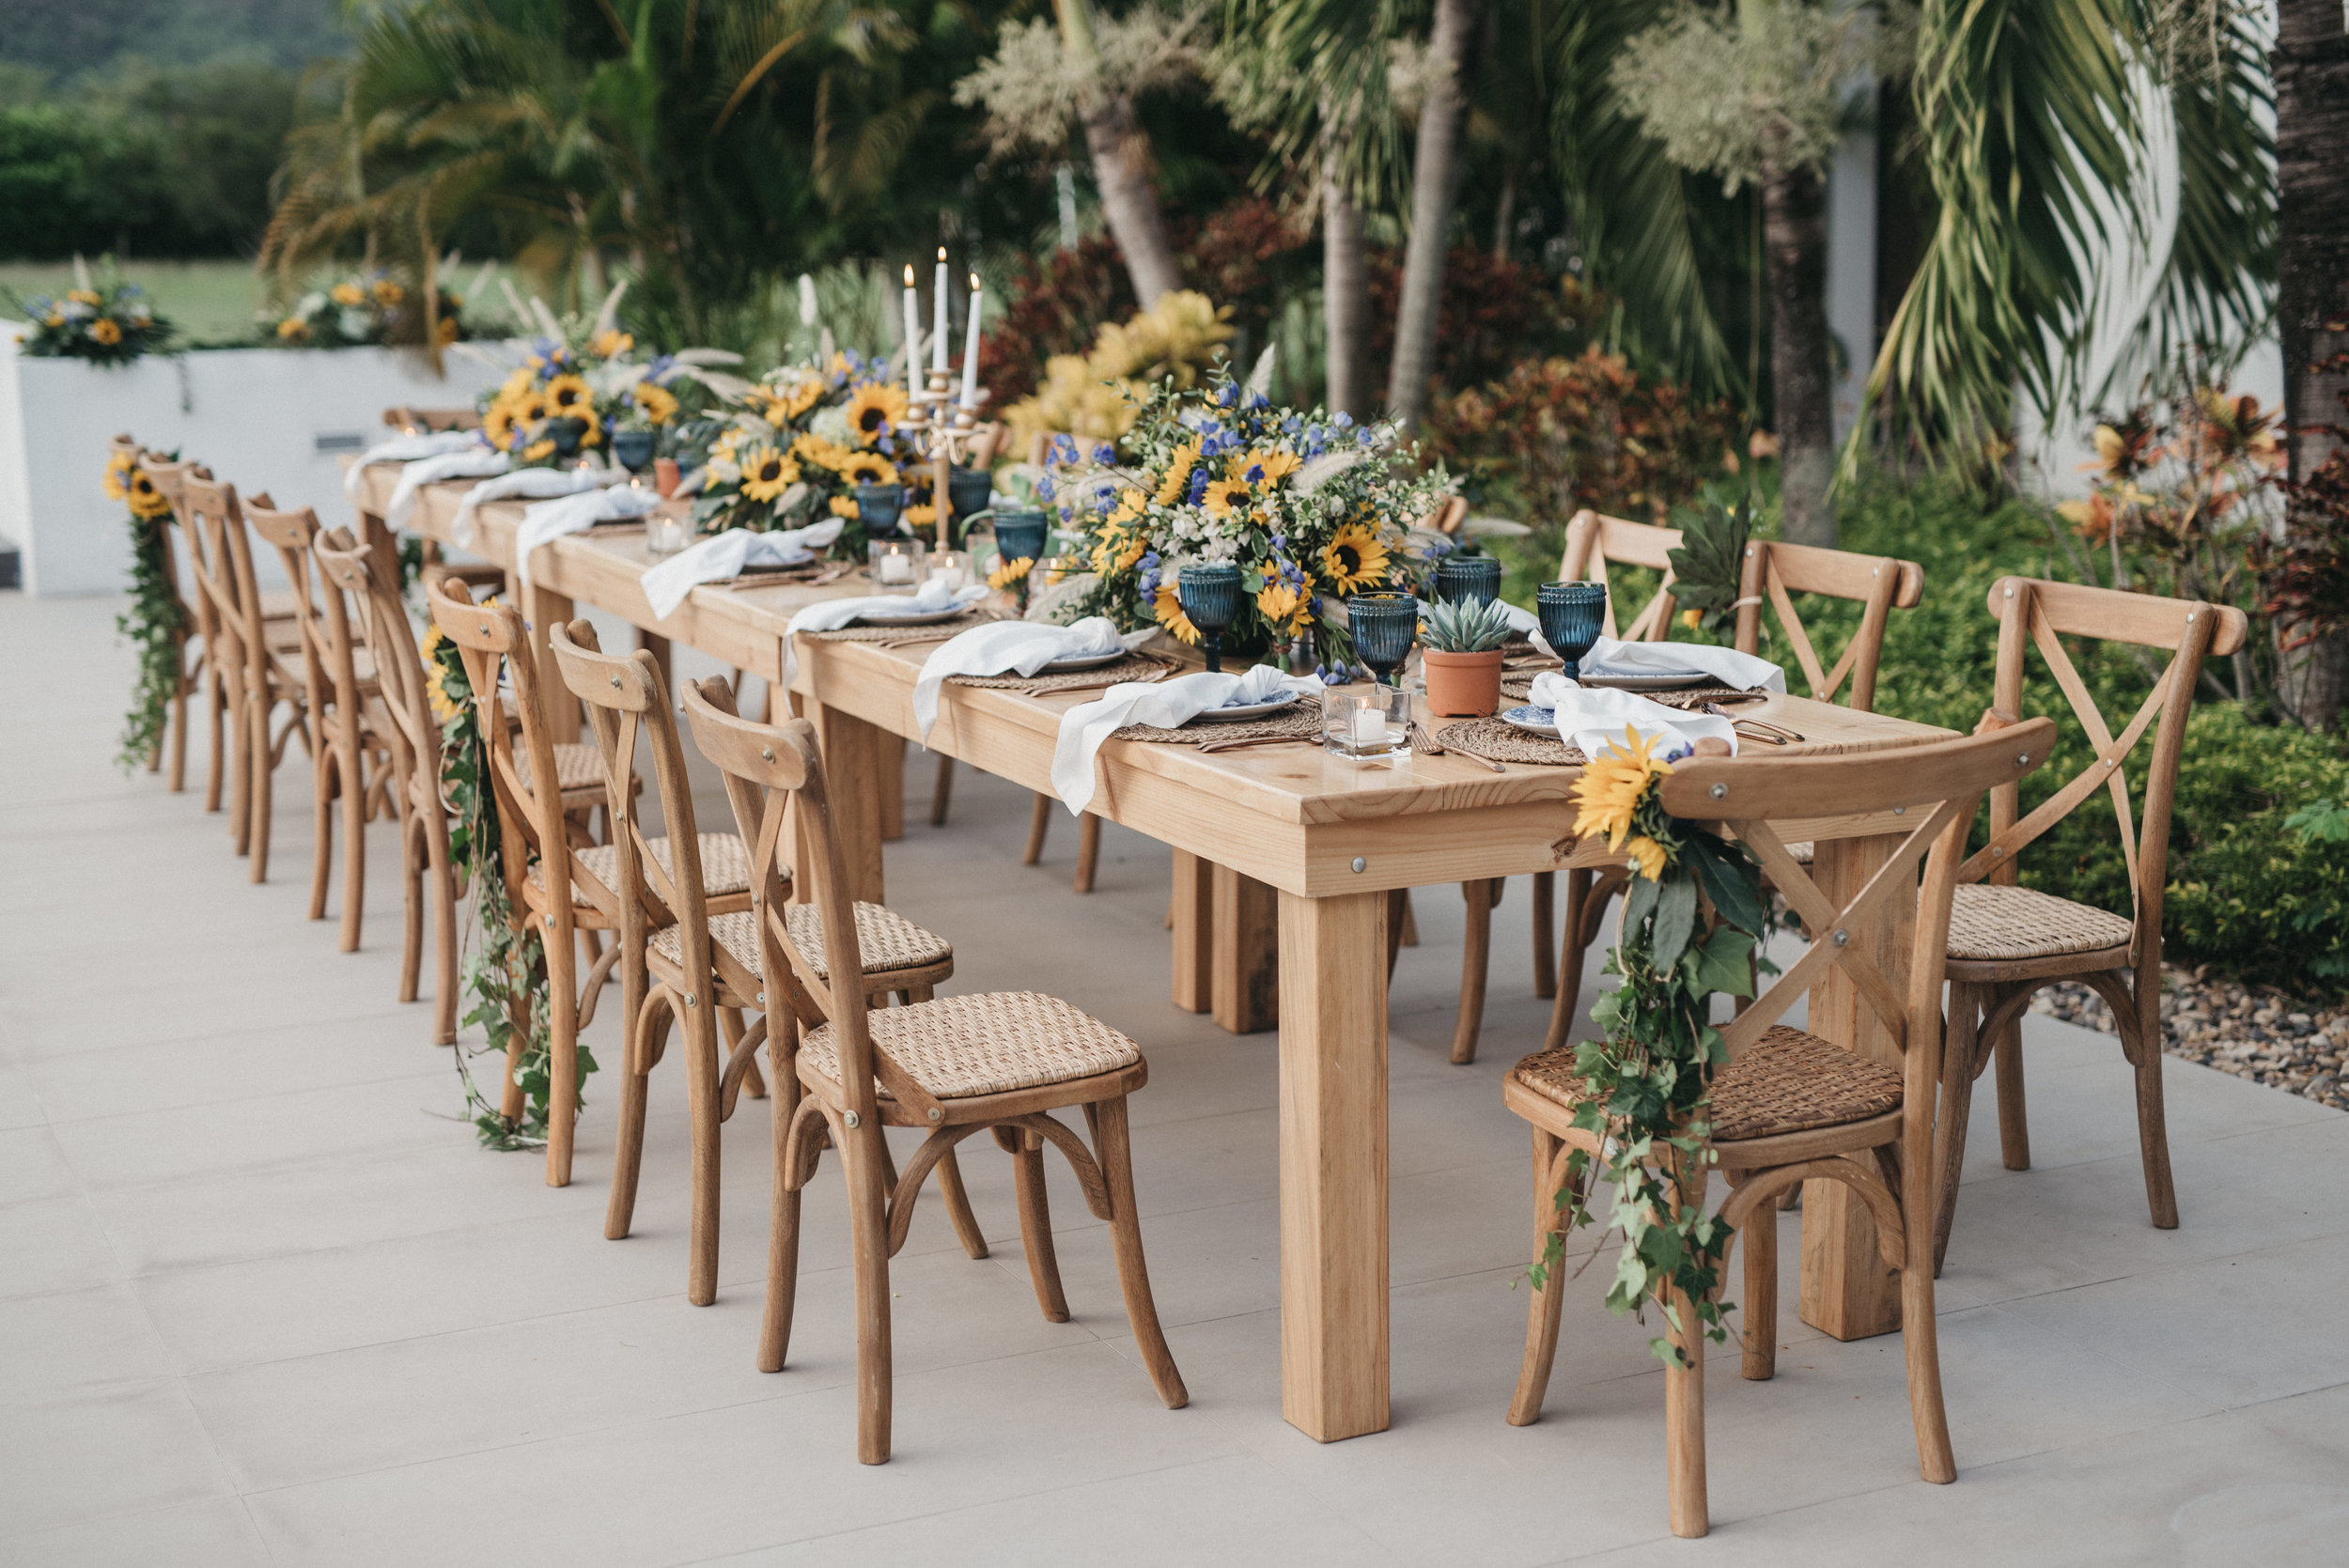 Juliethbravo-weddingplanner-matrimonio-aniversario-bodadestino-destinationwedding-colombia-love-ricaurte-sunflowers.jpg